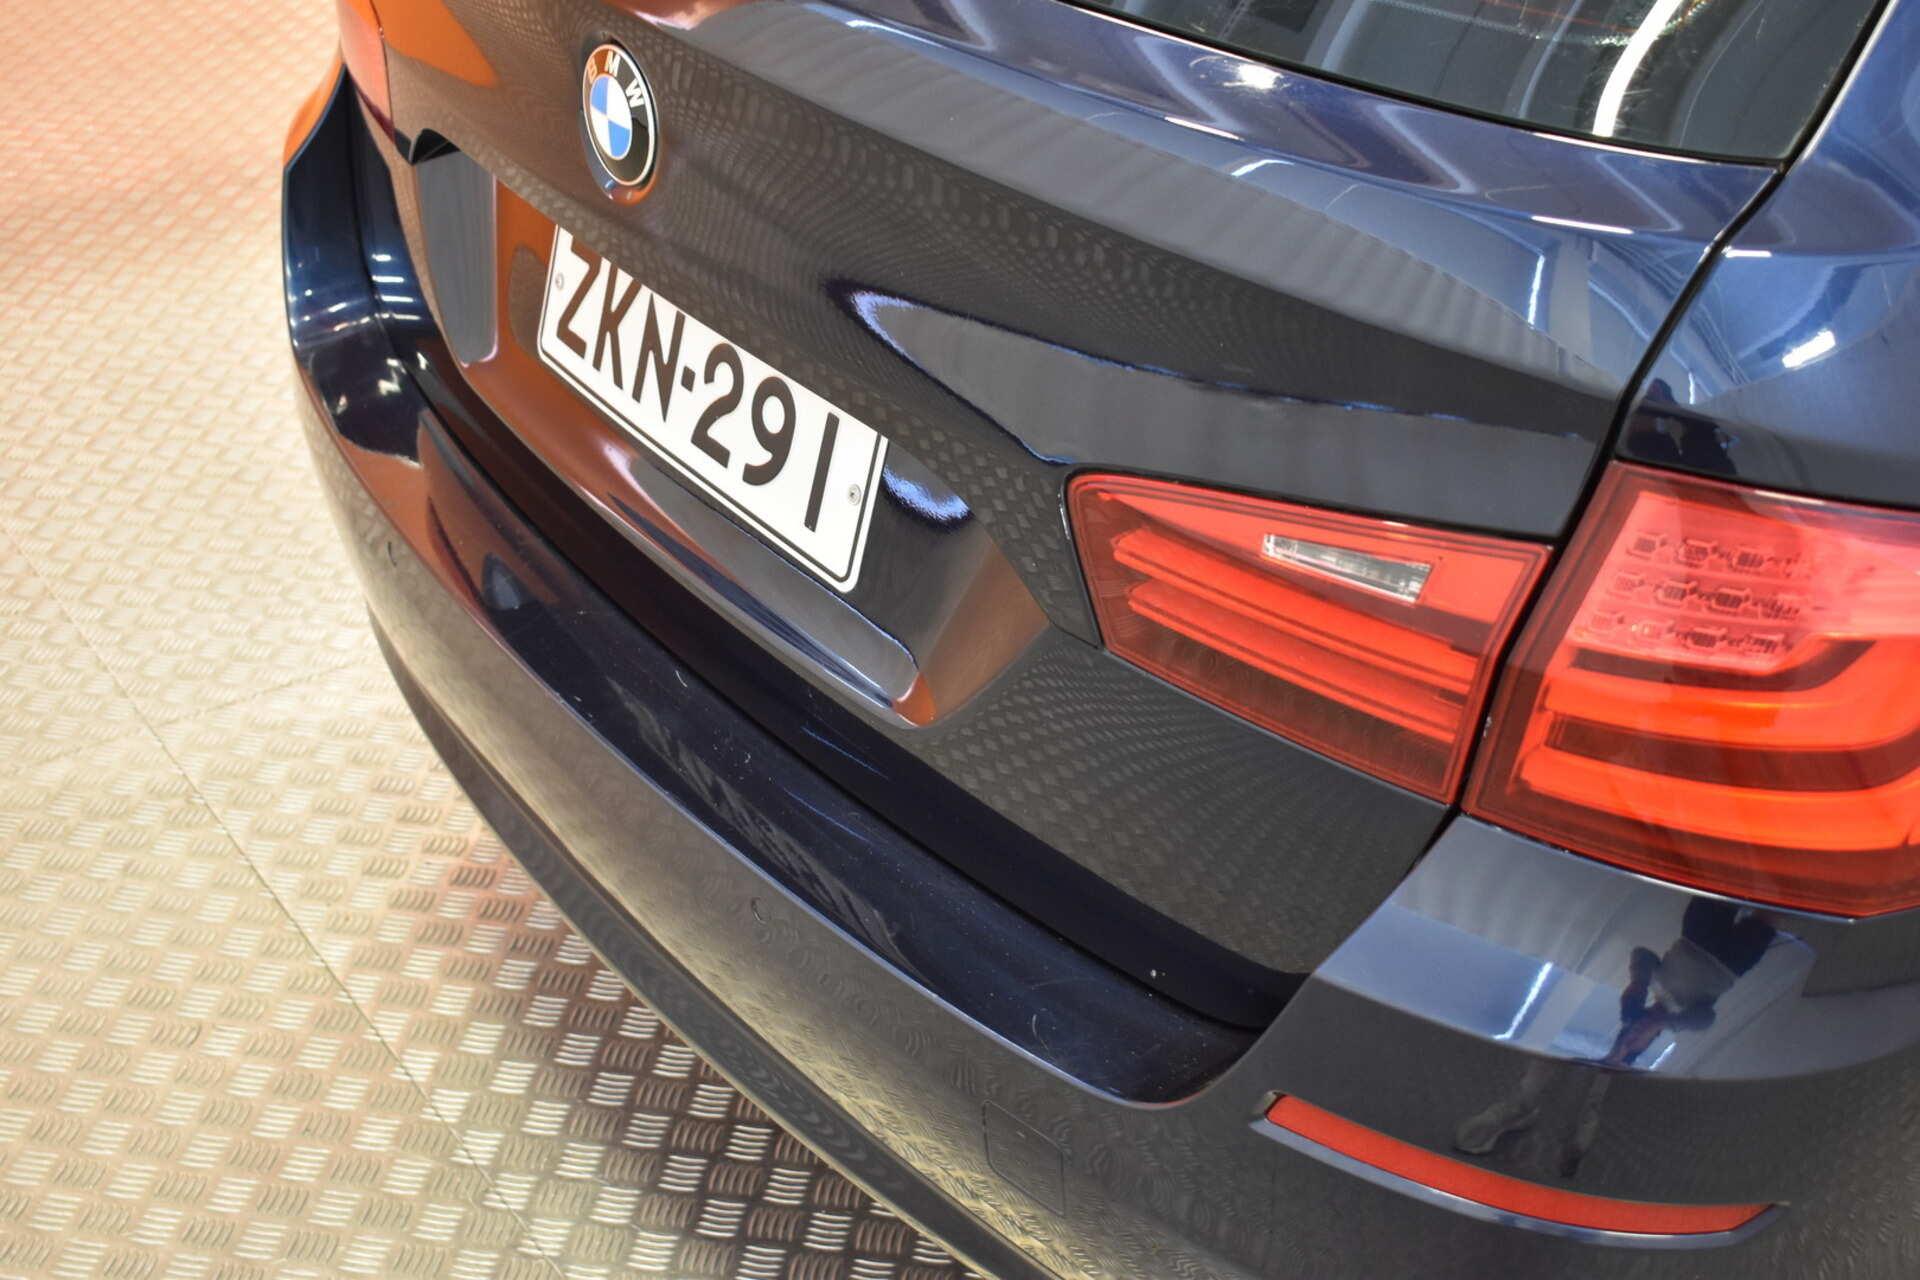 BMW 520 - 113645 - kuva 10